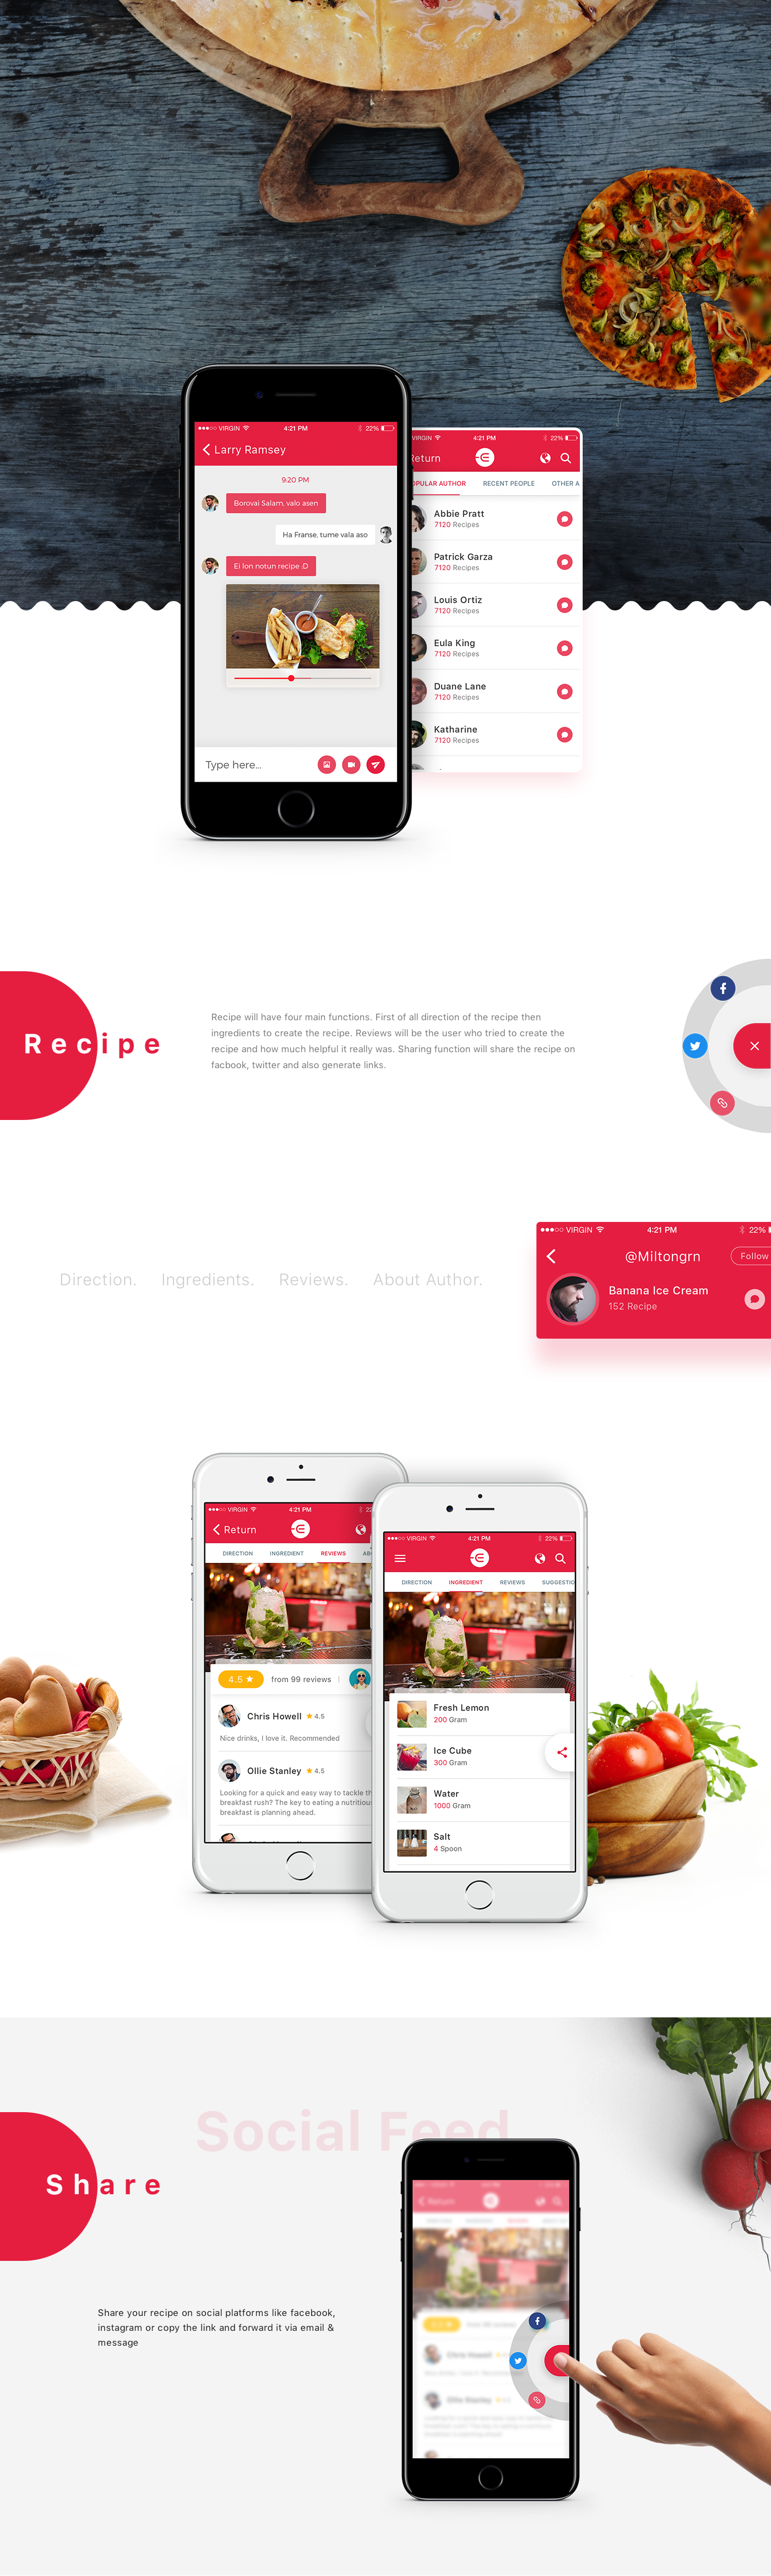 design Food  recipe psd freebie map ui kit splash minimal material